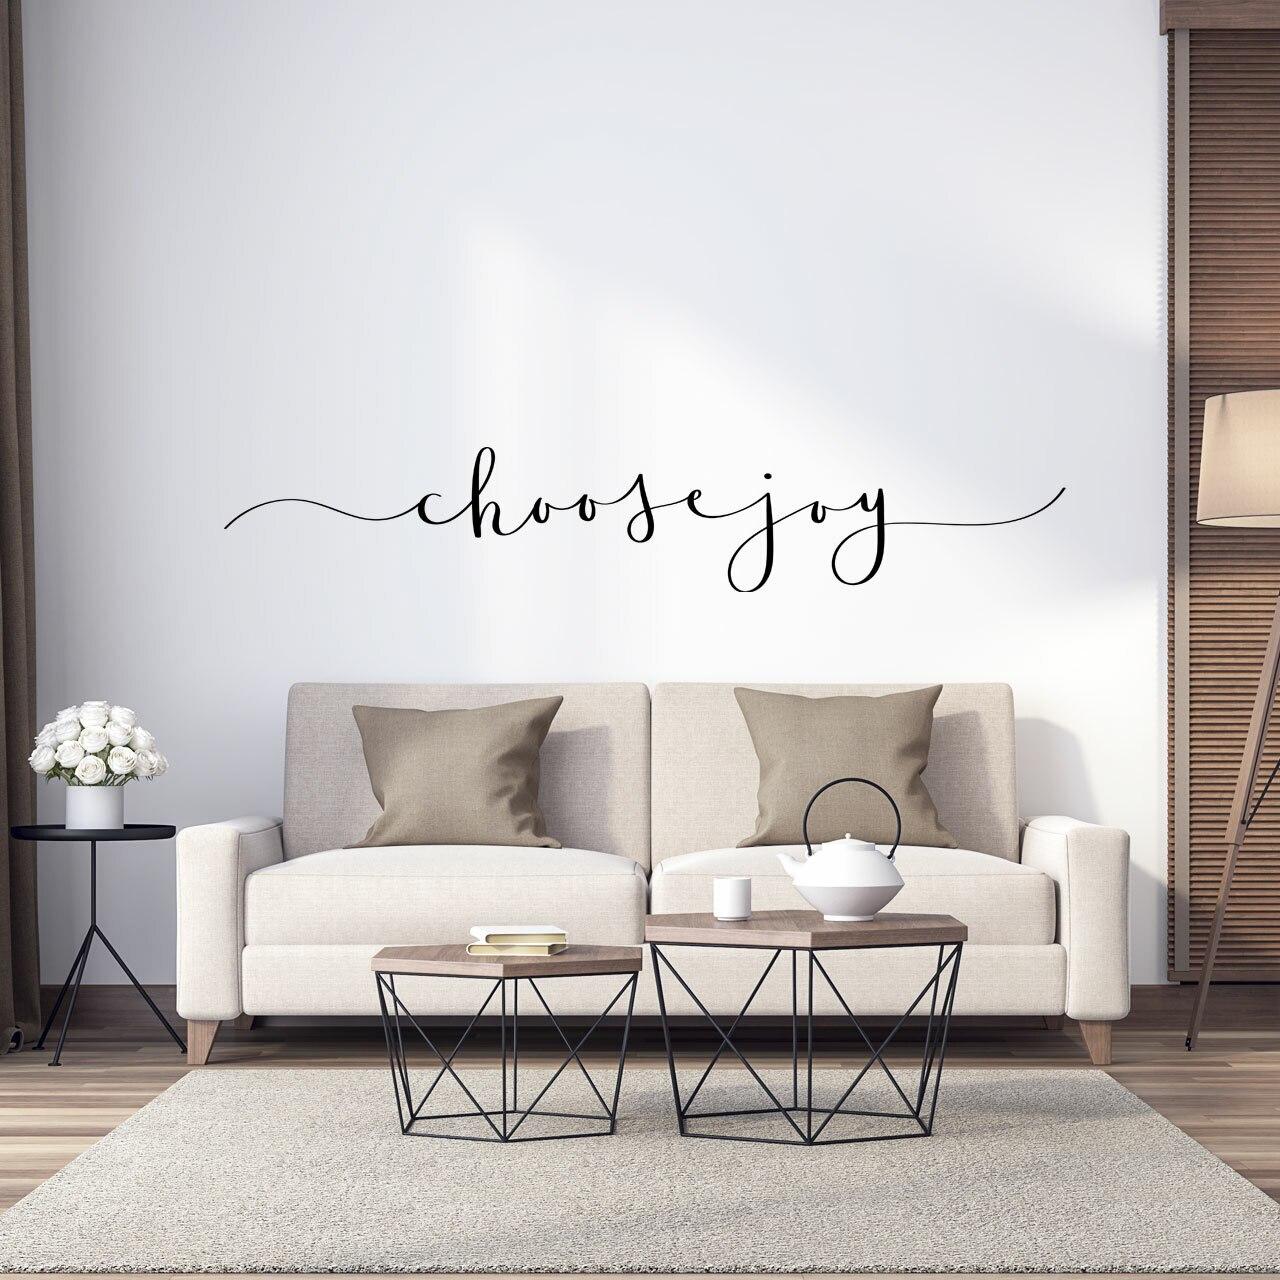 """choose joy"" written in a flowing script font in black vinyl lettering on a white wall over a beige couch"